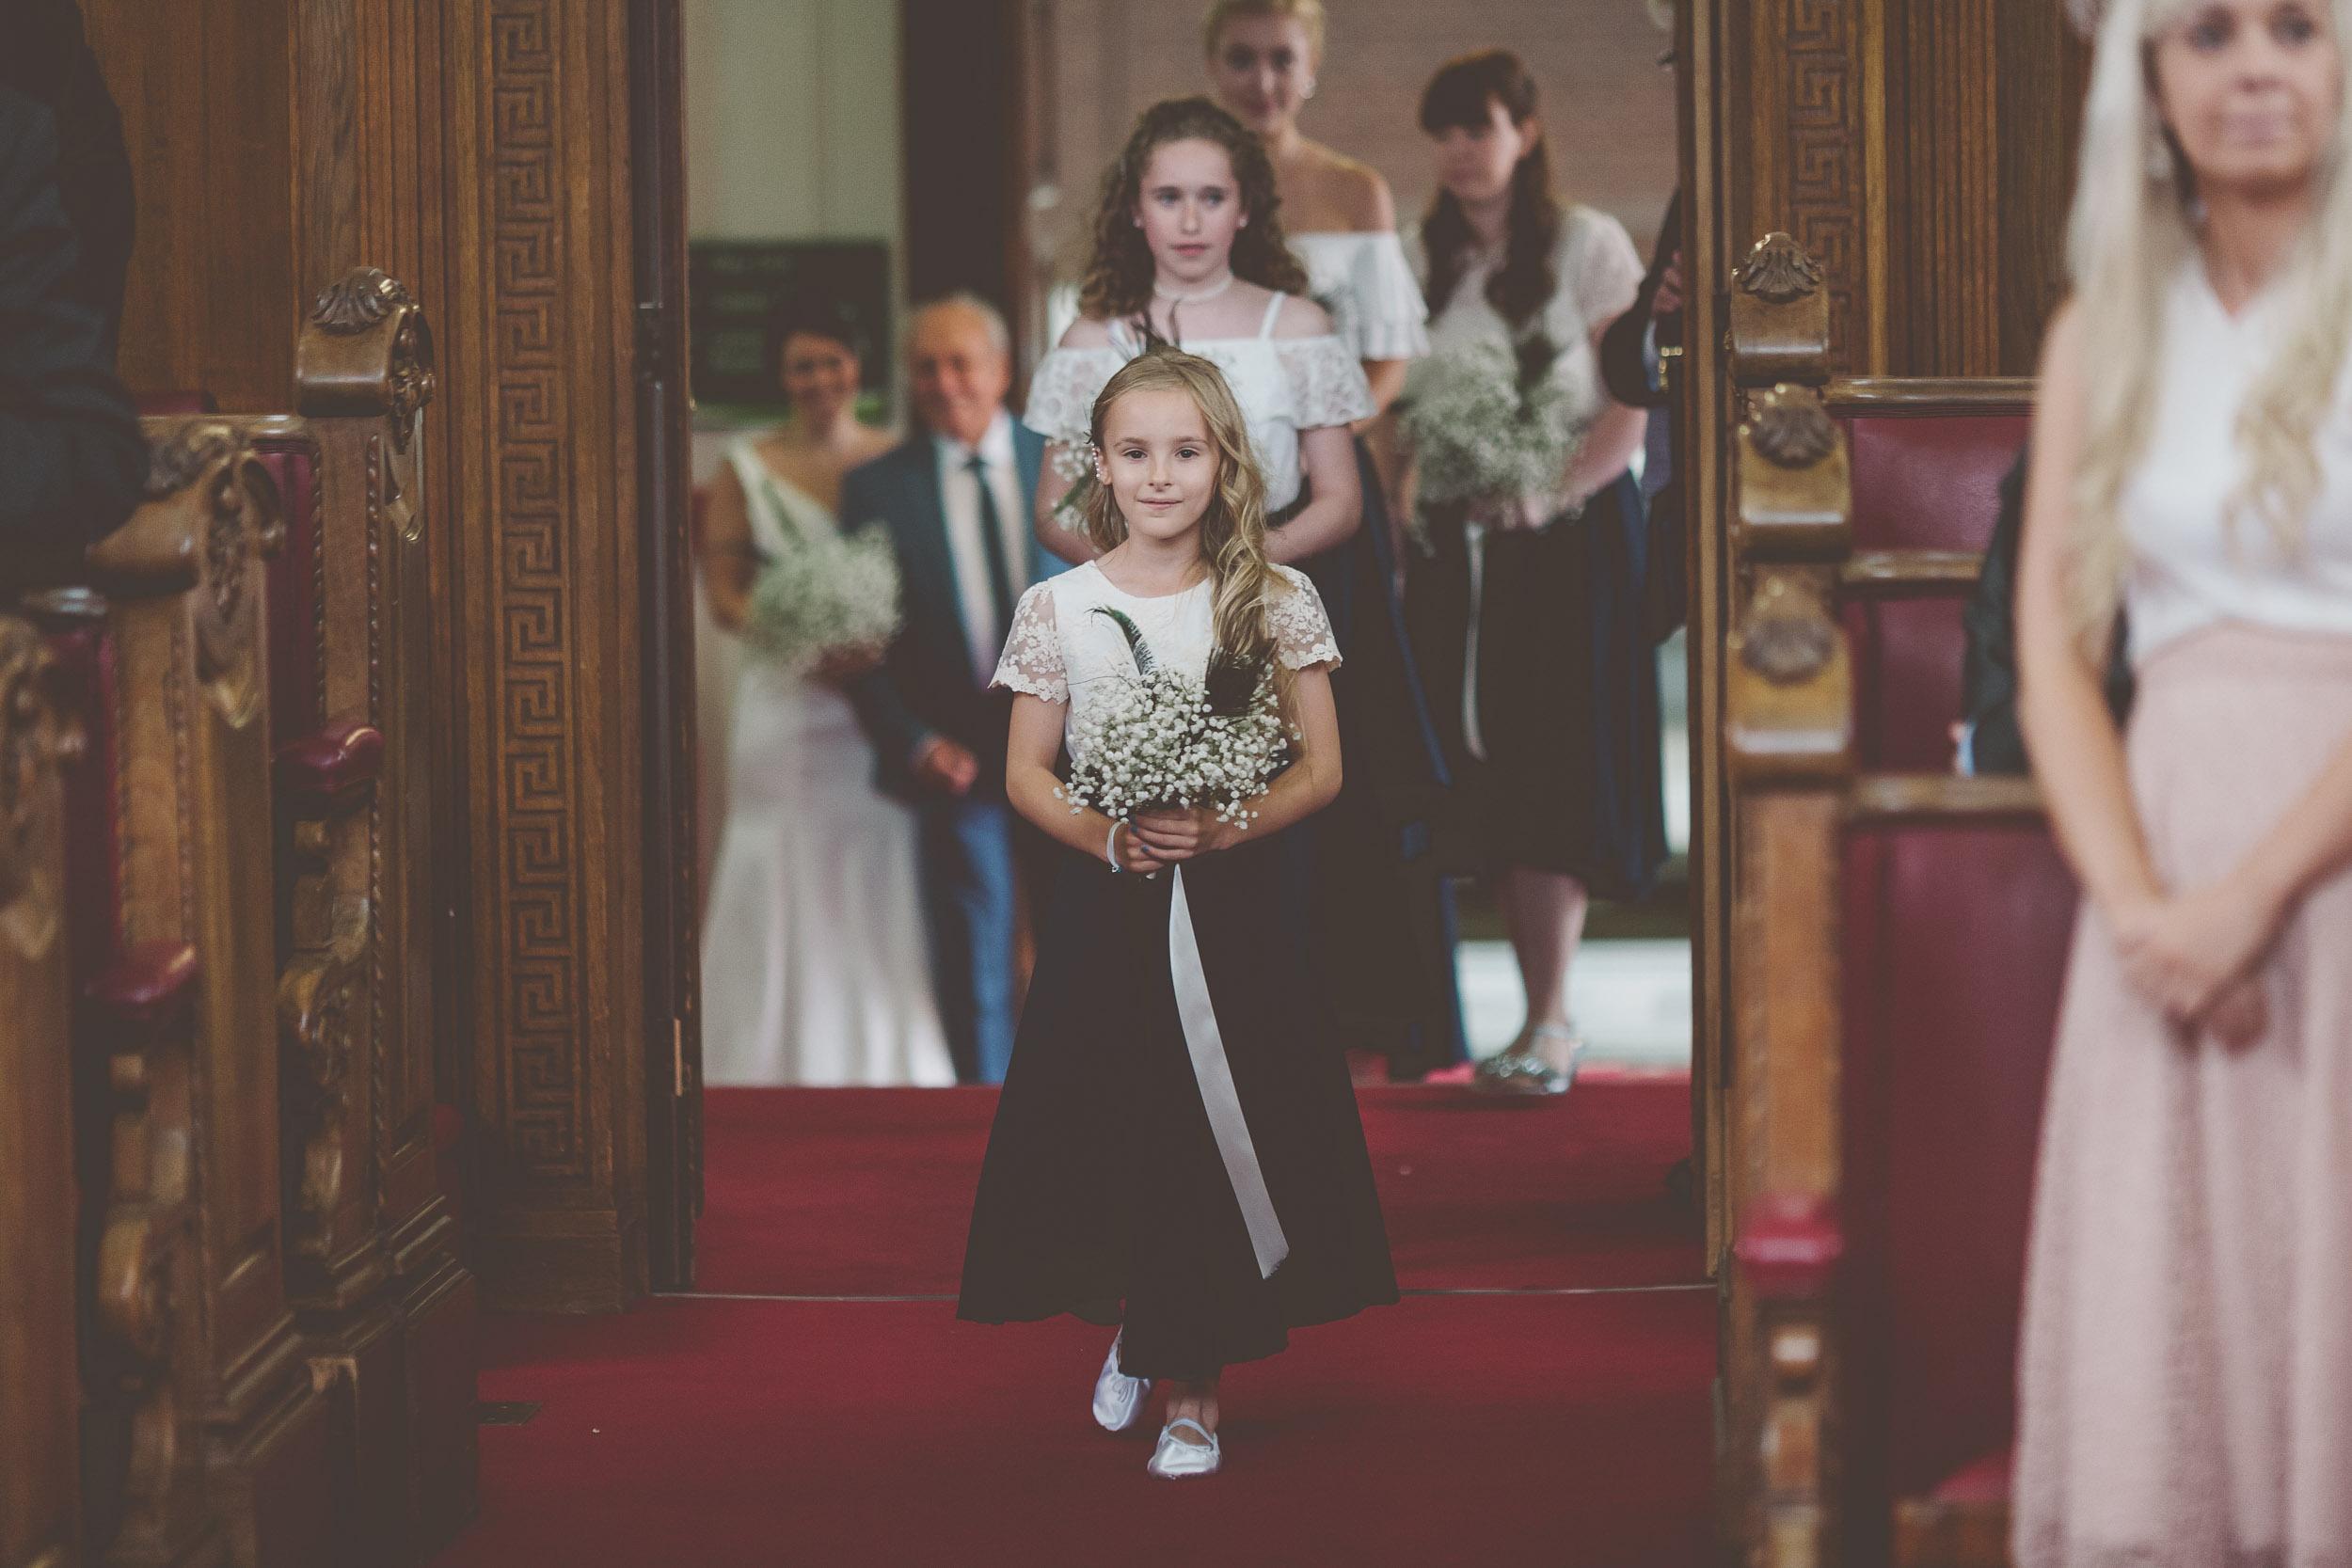 islington-town-hall-4th-floor-studios-wedding046.jpg